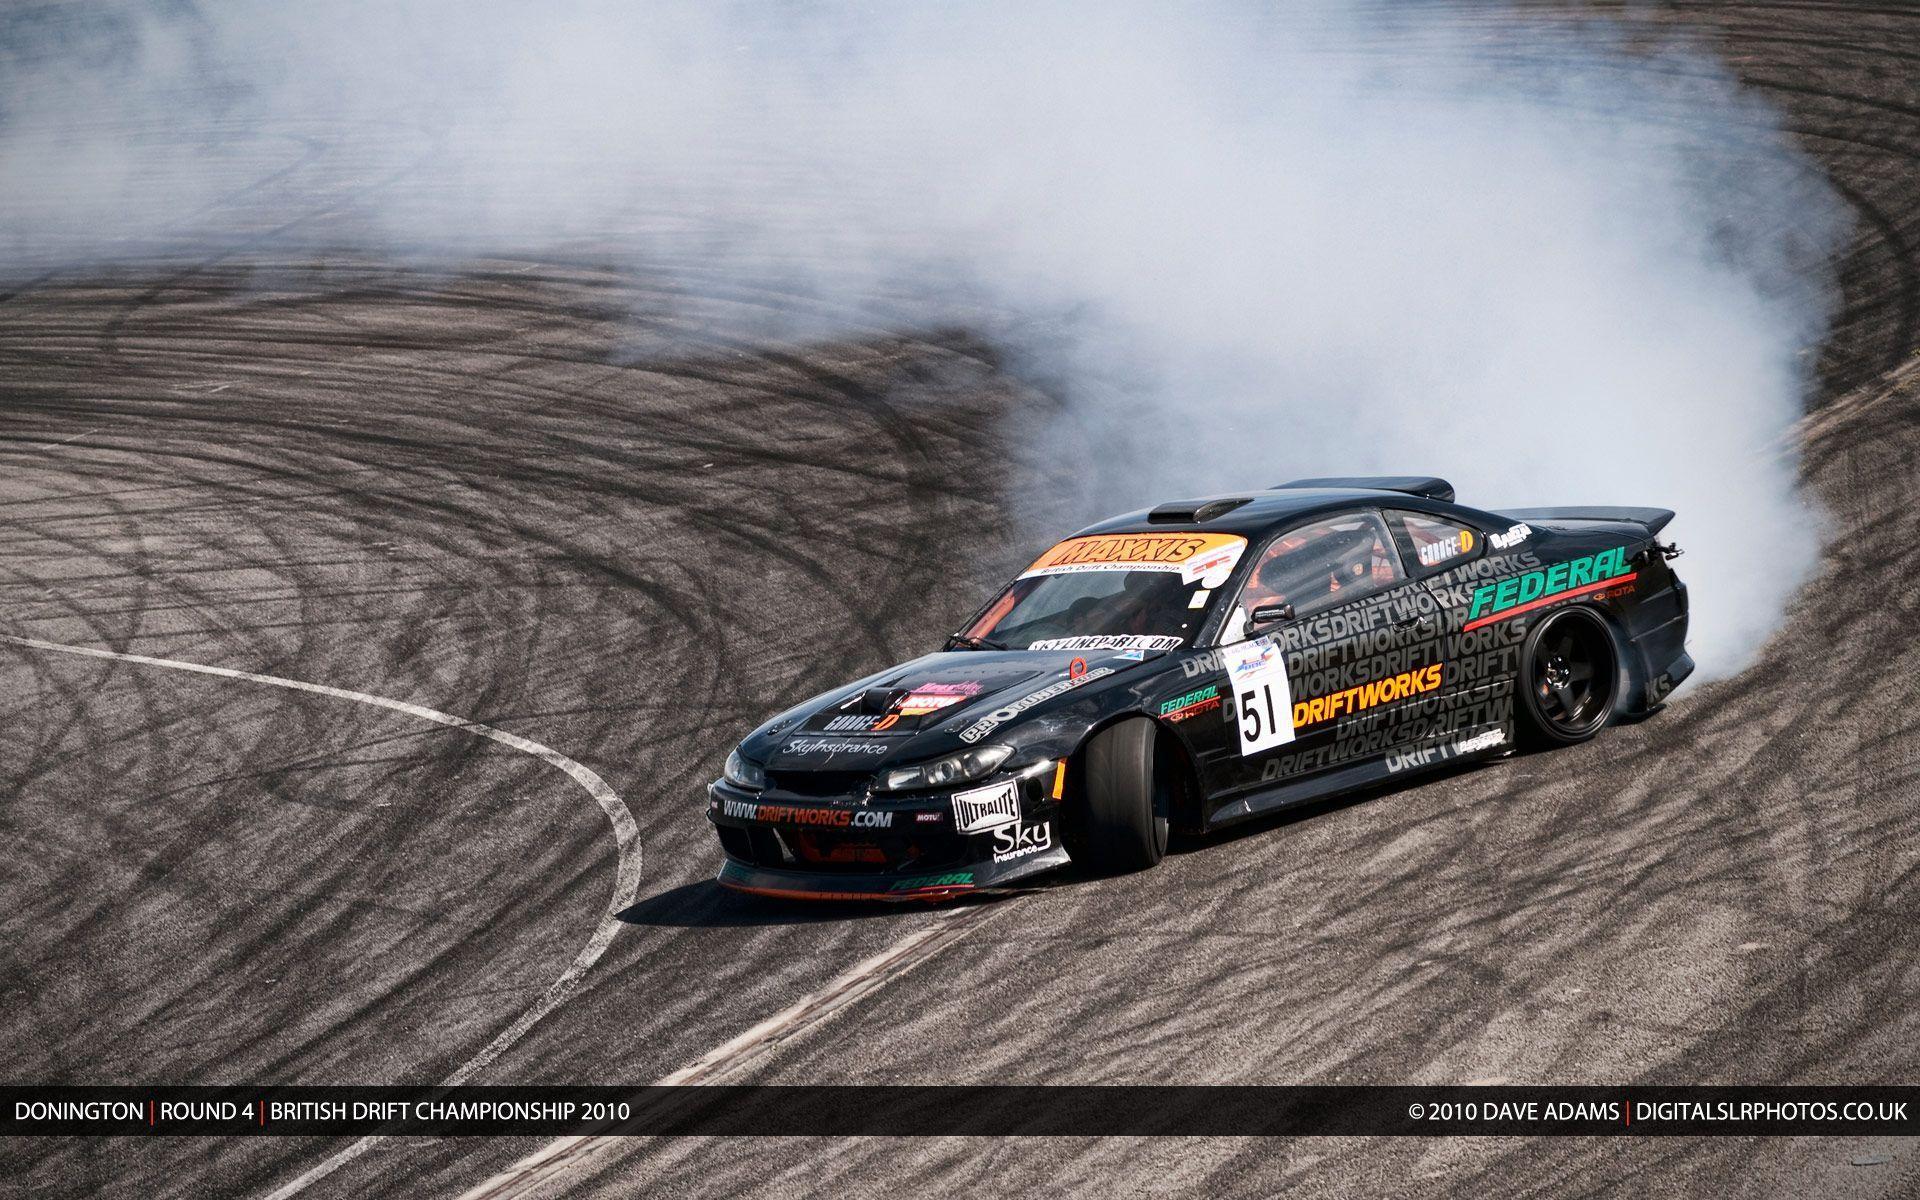 Supra Drift Wallpaper 1080p Kon Drifting Drift Cars Drifting Cars